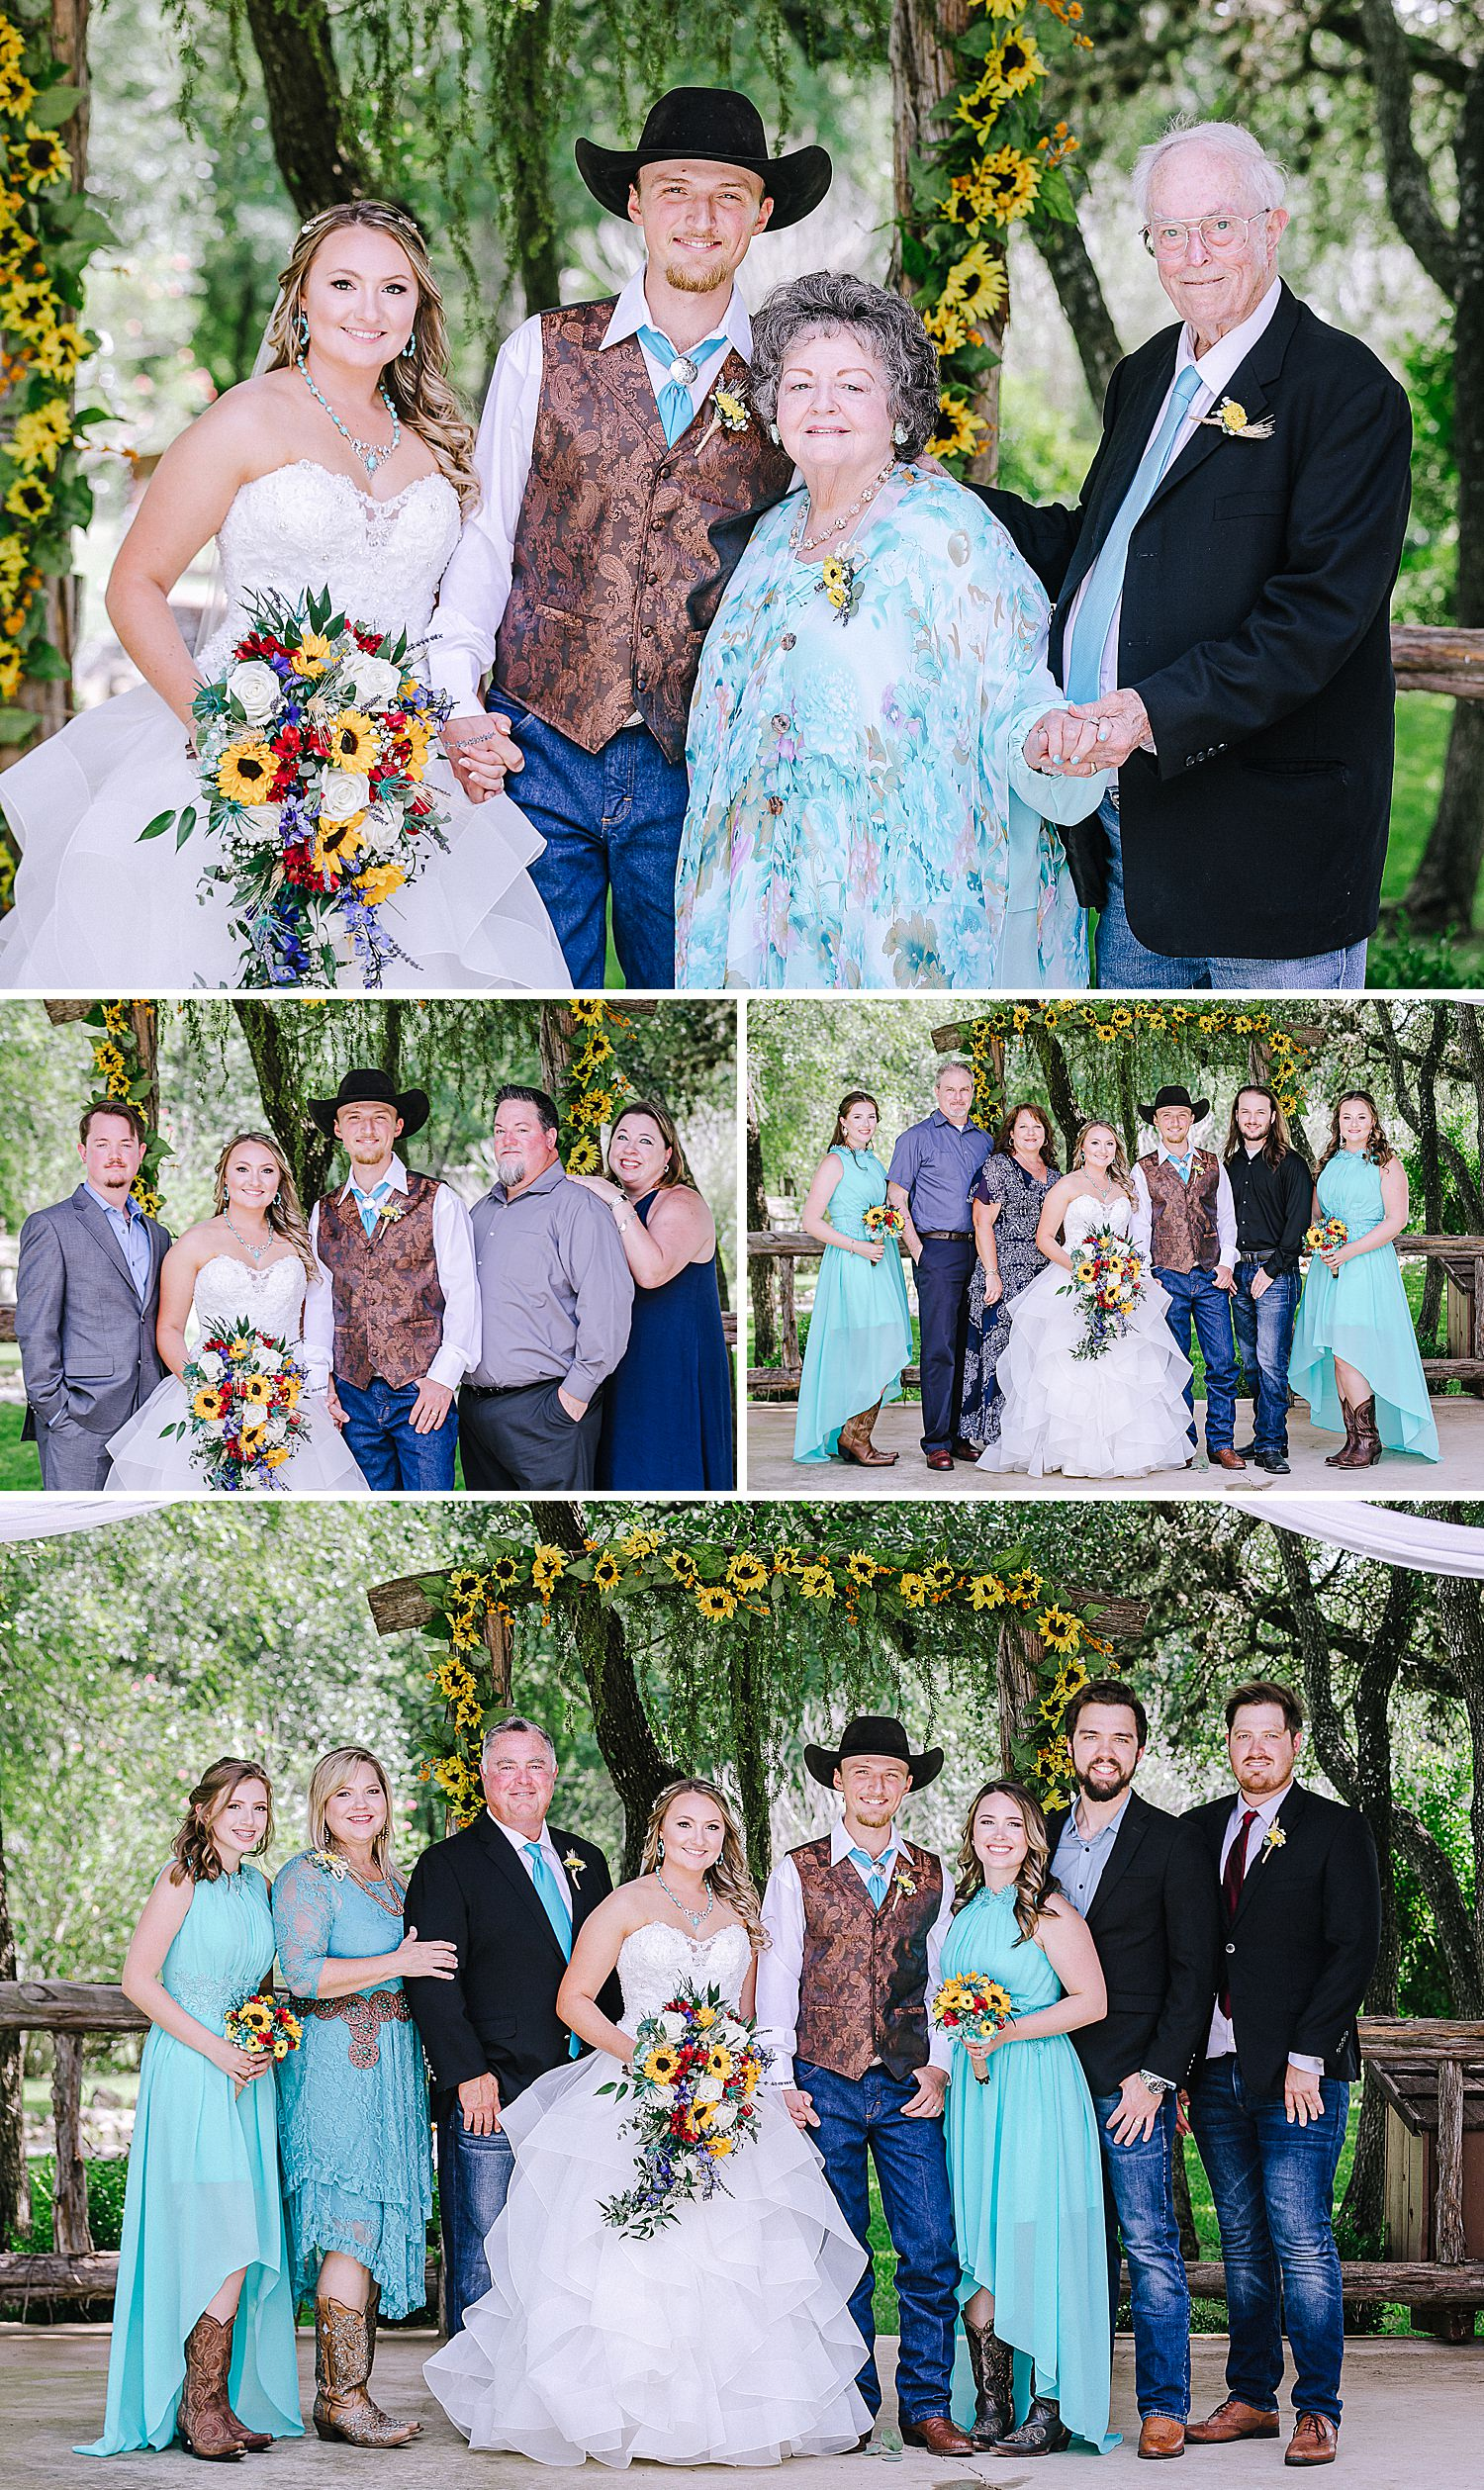 Carly-Barton-Photography-Old-Town-Texas-Rustic-Wedding-Photos-Sunflowers-Boots-Kyle-Texas_0049.jpg